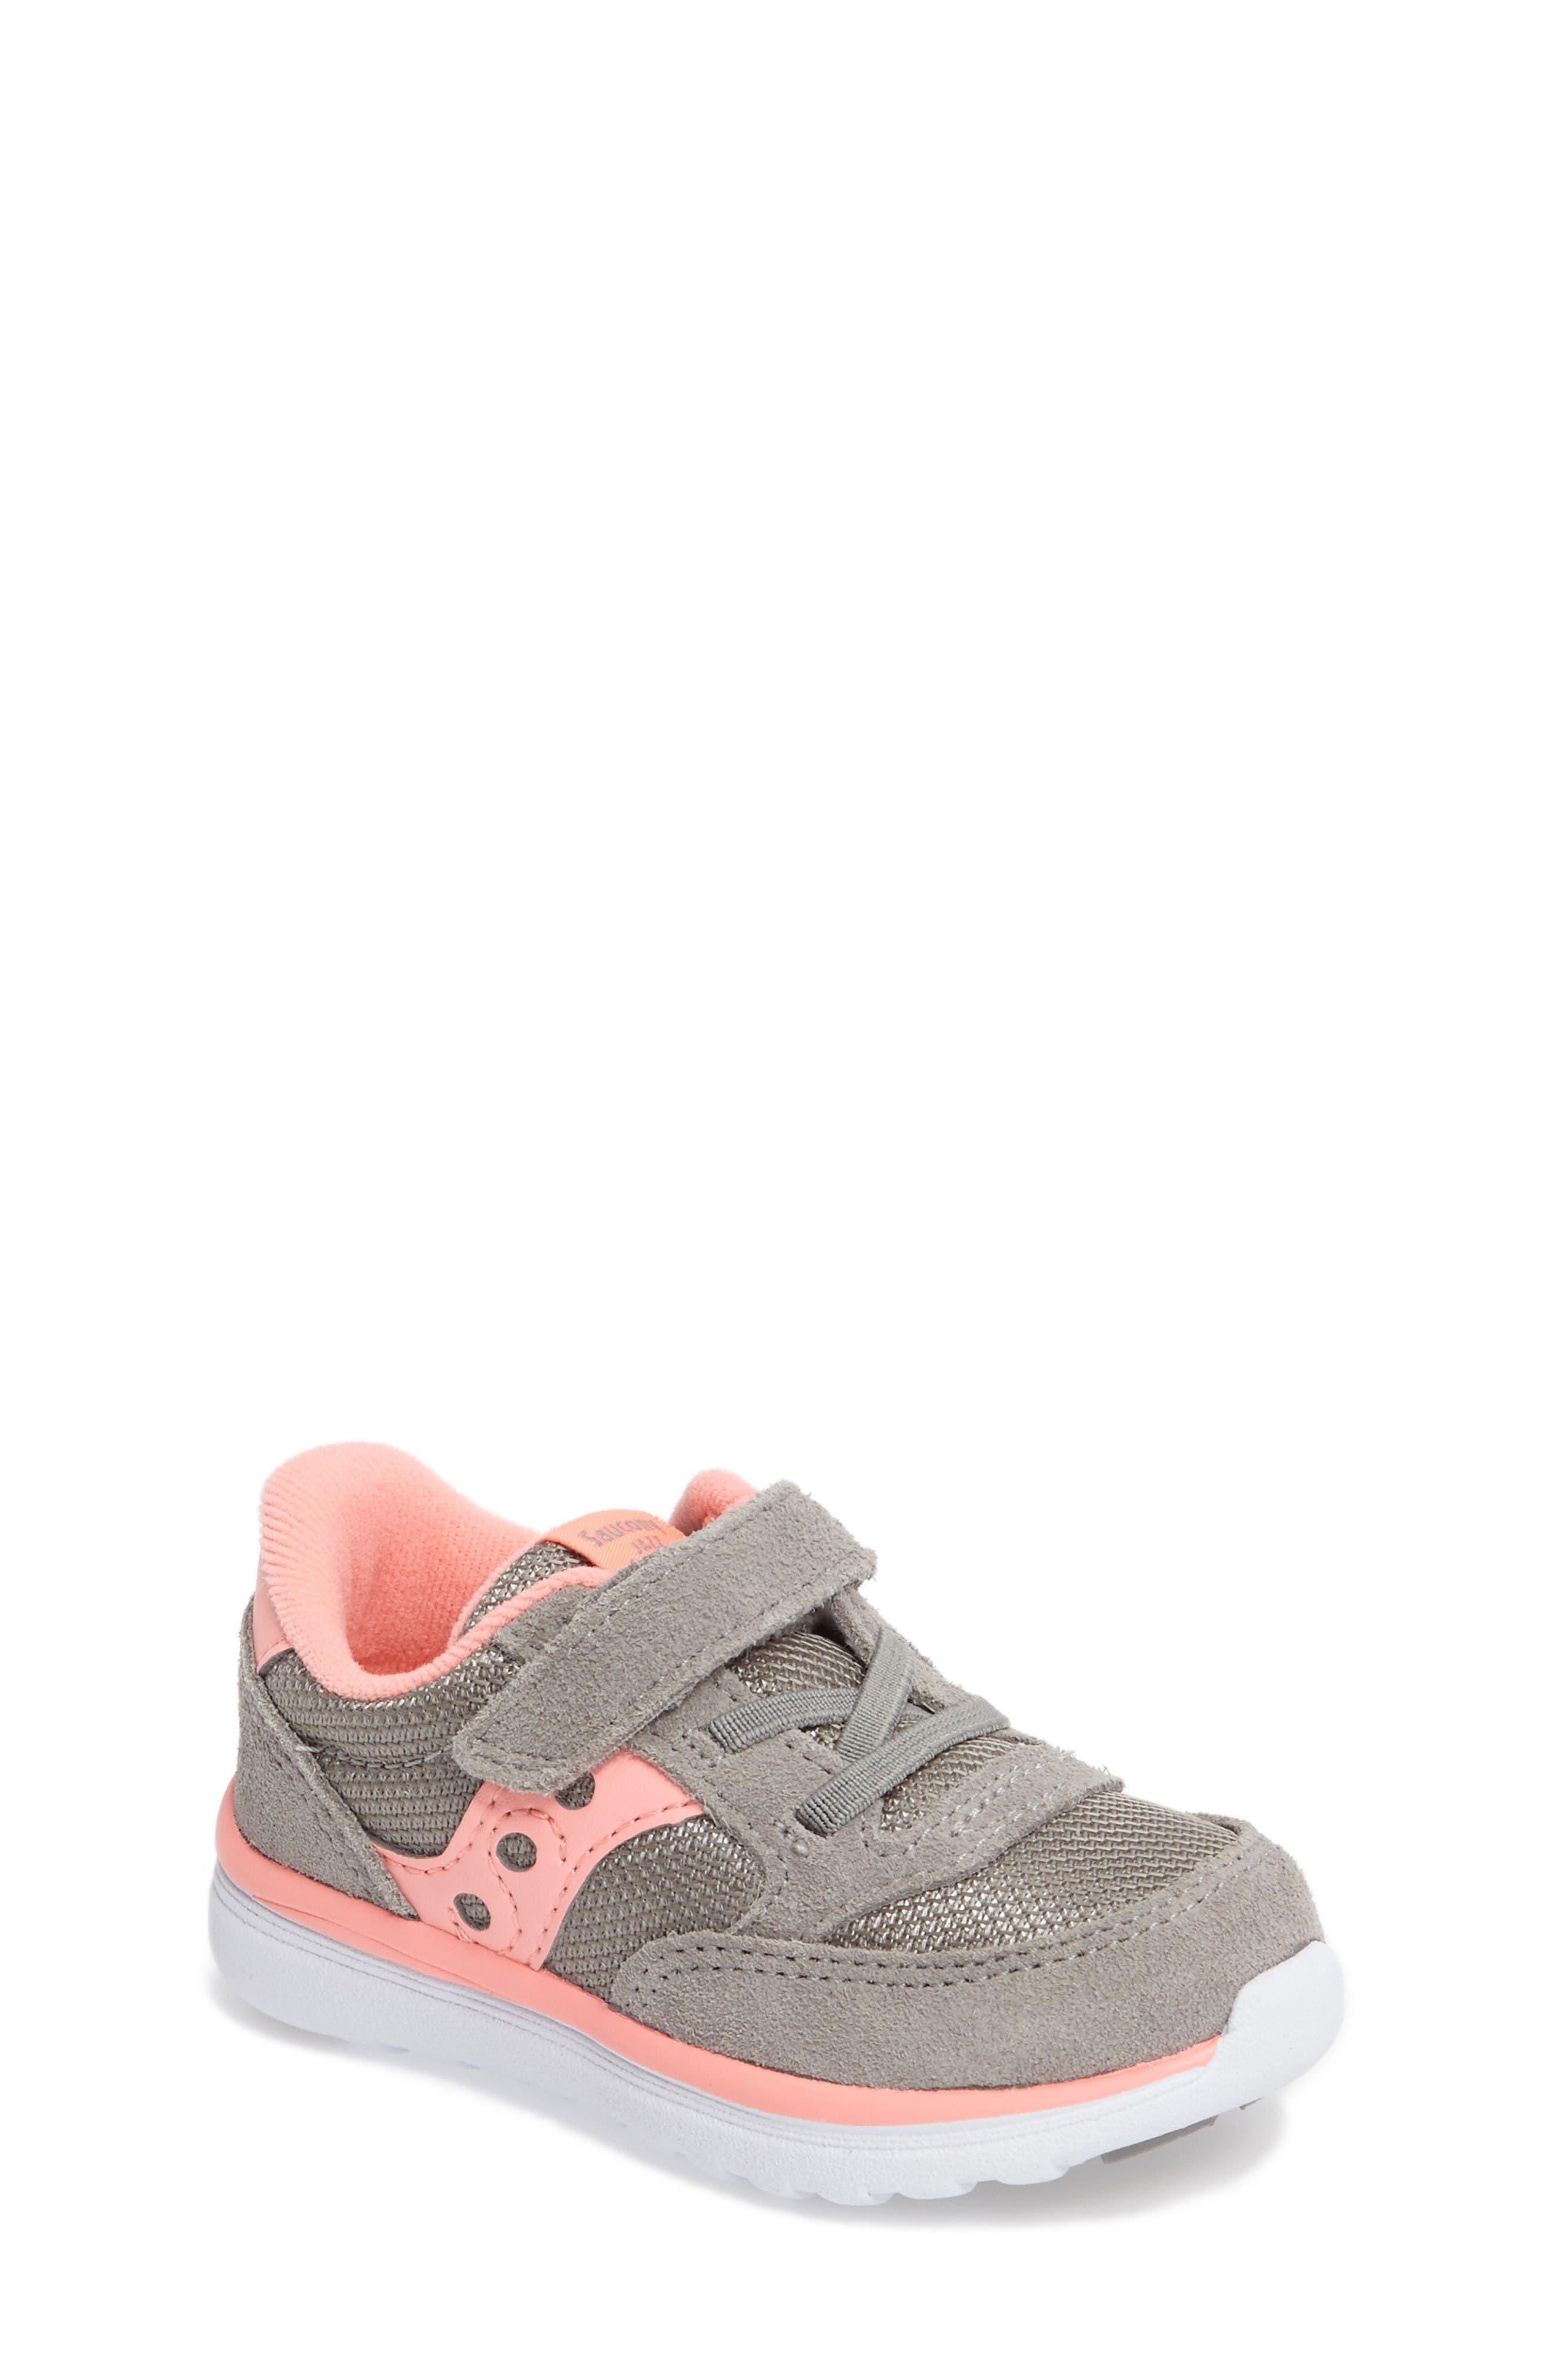 Jazz Lite Sneaker,                         Main,                         color, Grey/ Coral